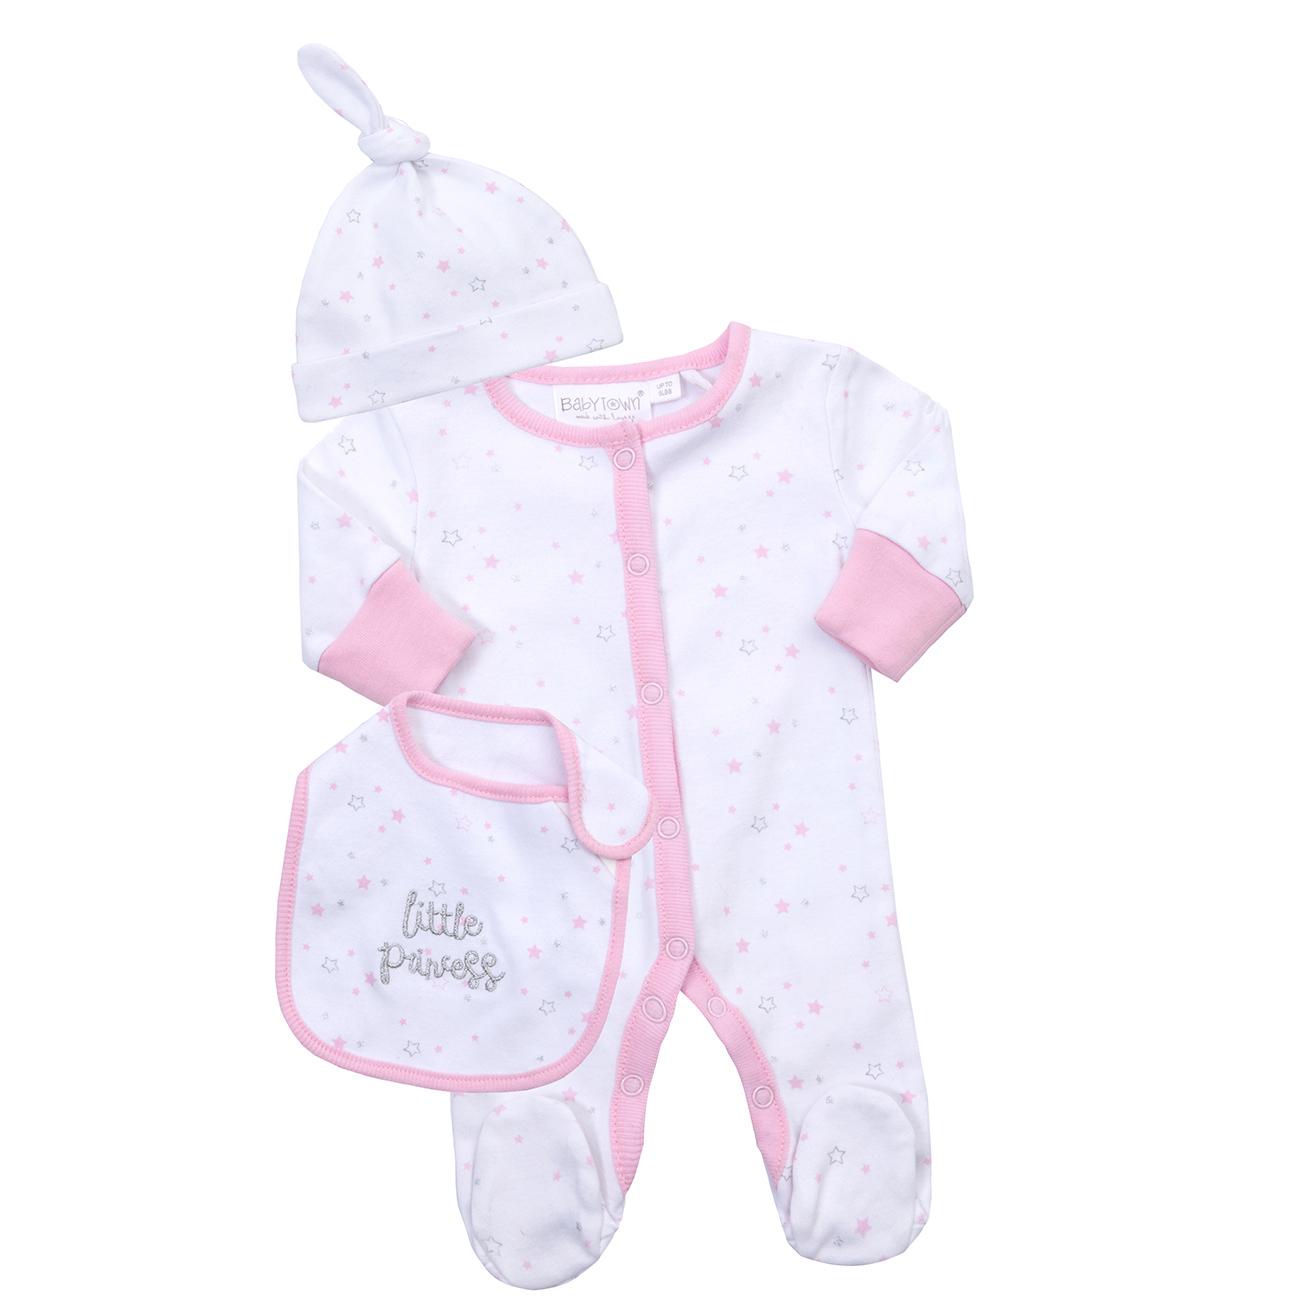 Cotton Prem BABY BOYS Girls Pink White Babygrow Bodysuit Sleepsuit Rompersuit